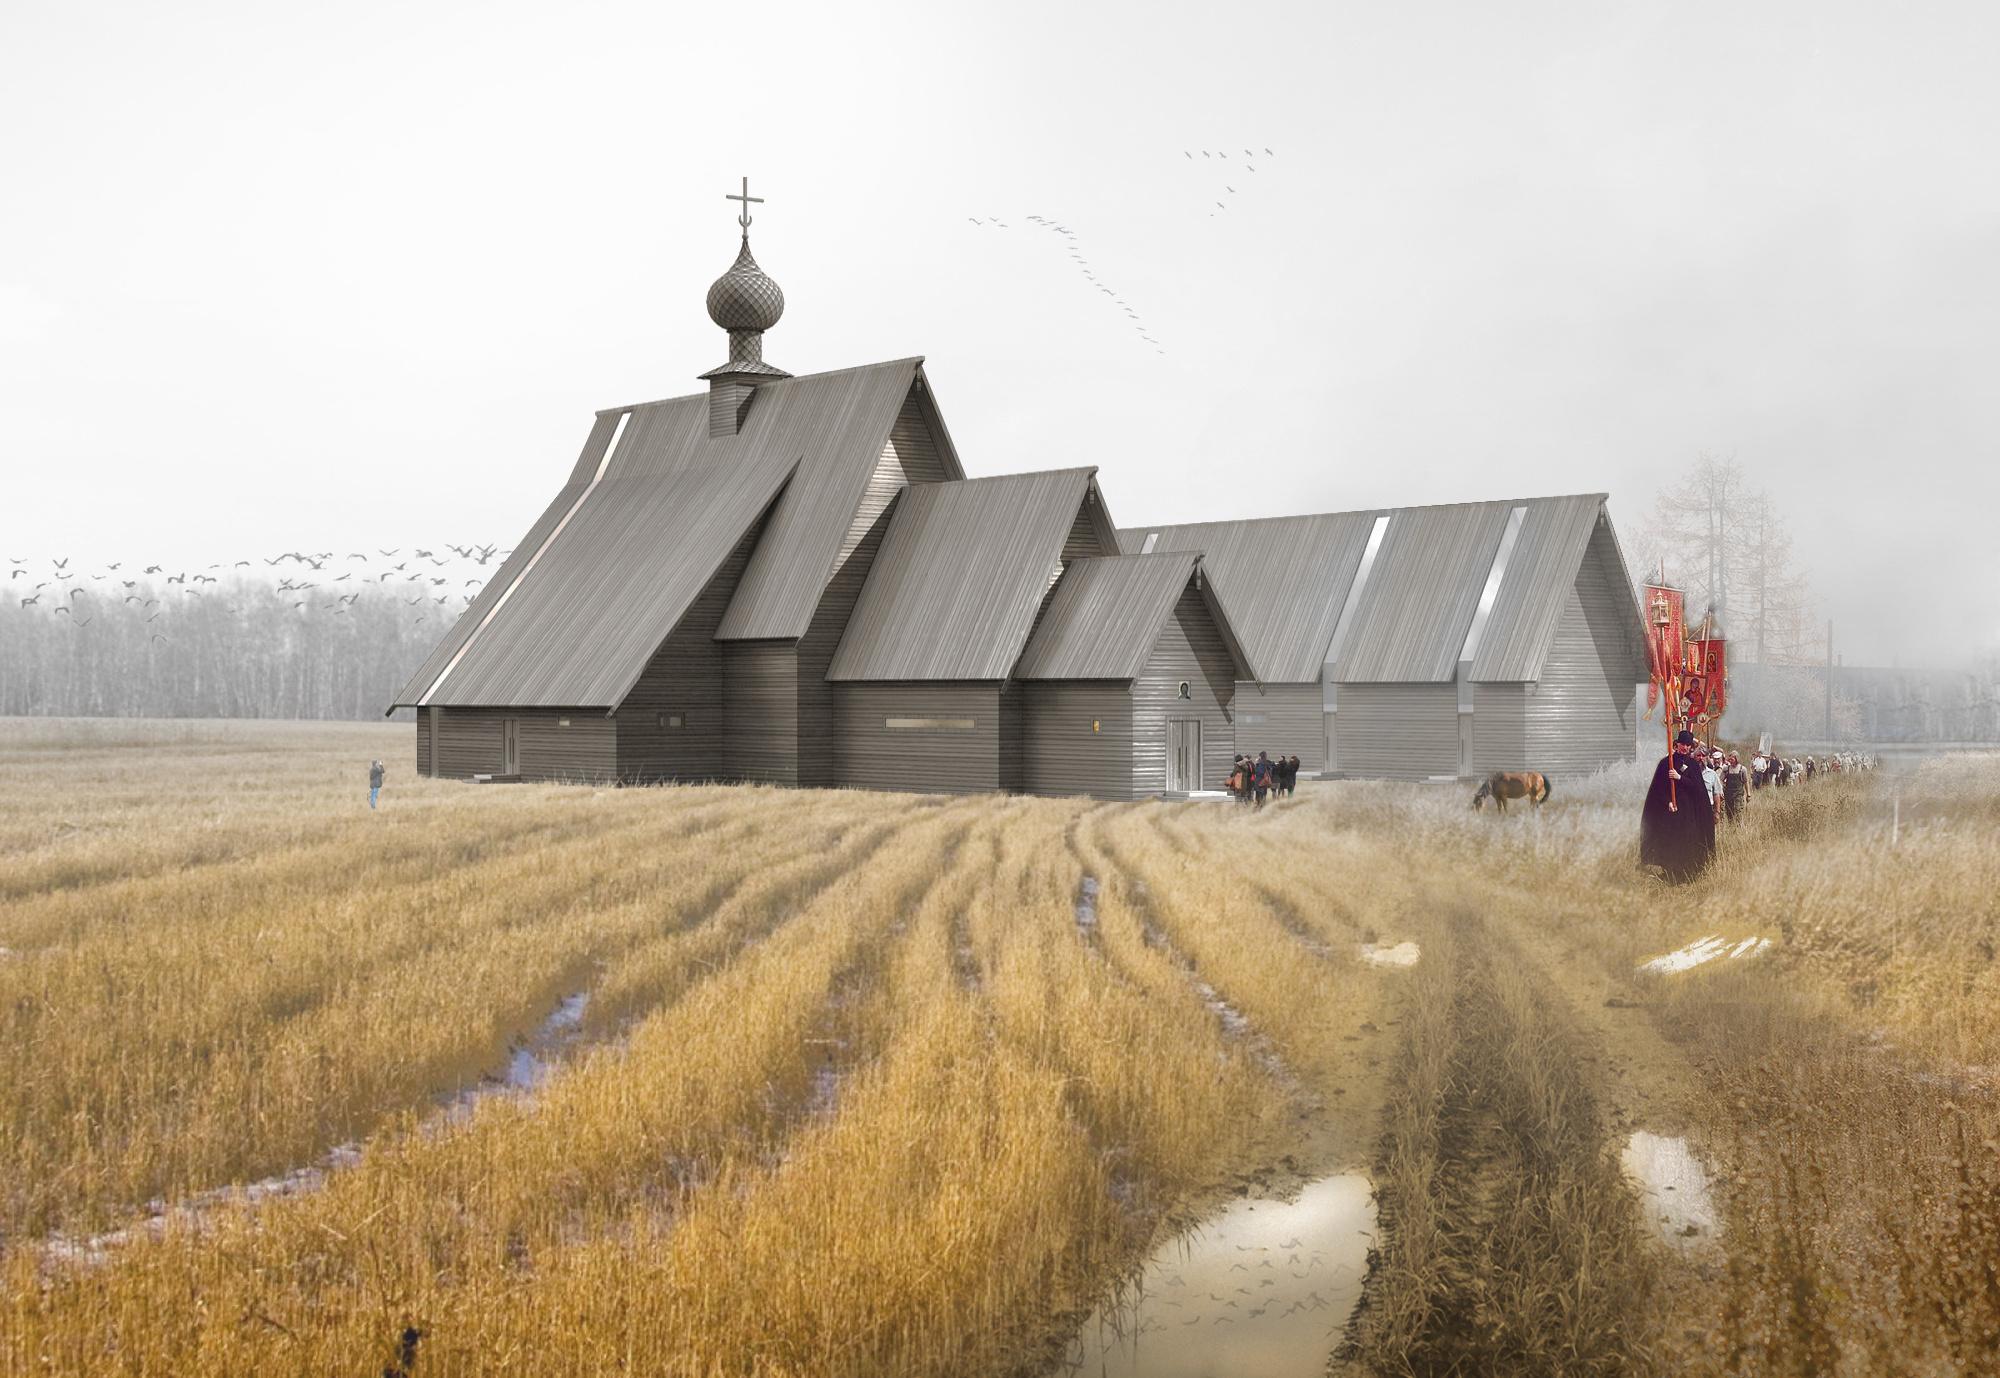 Храм на 600 человек. Перспектива. ©DMTRVK.RU